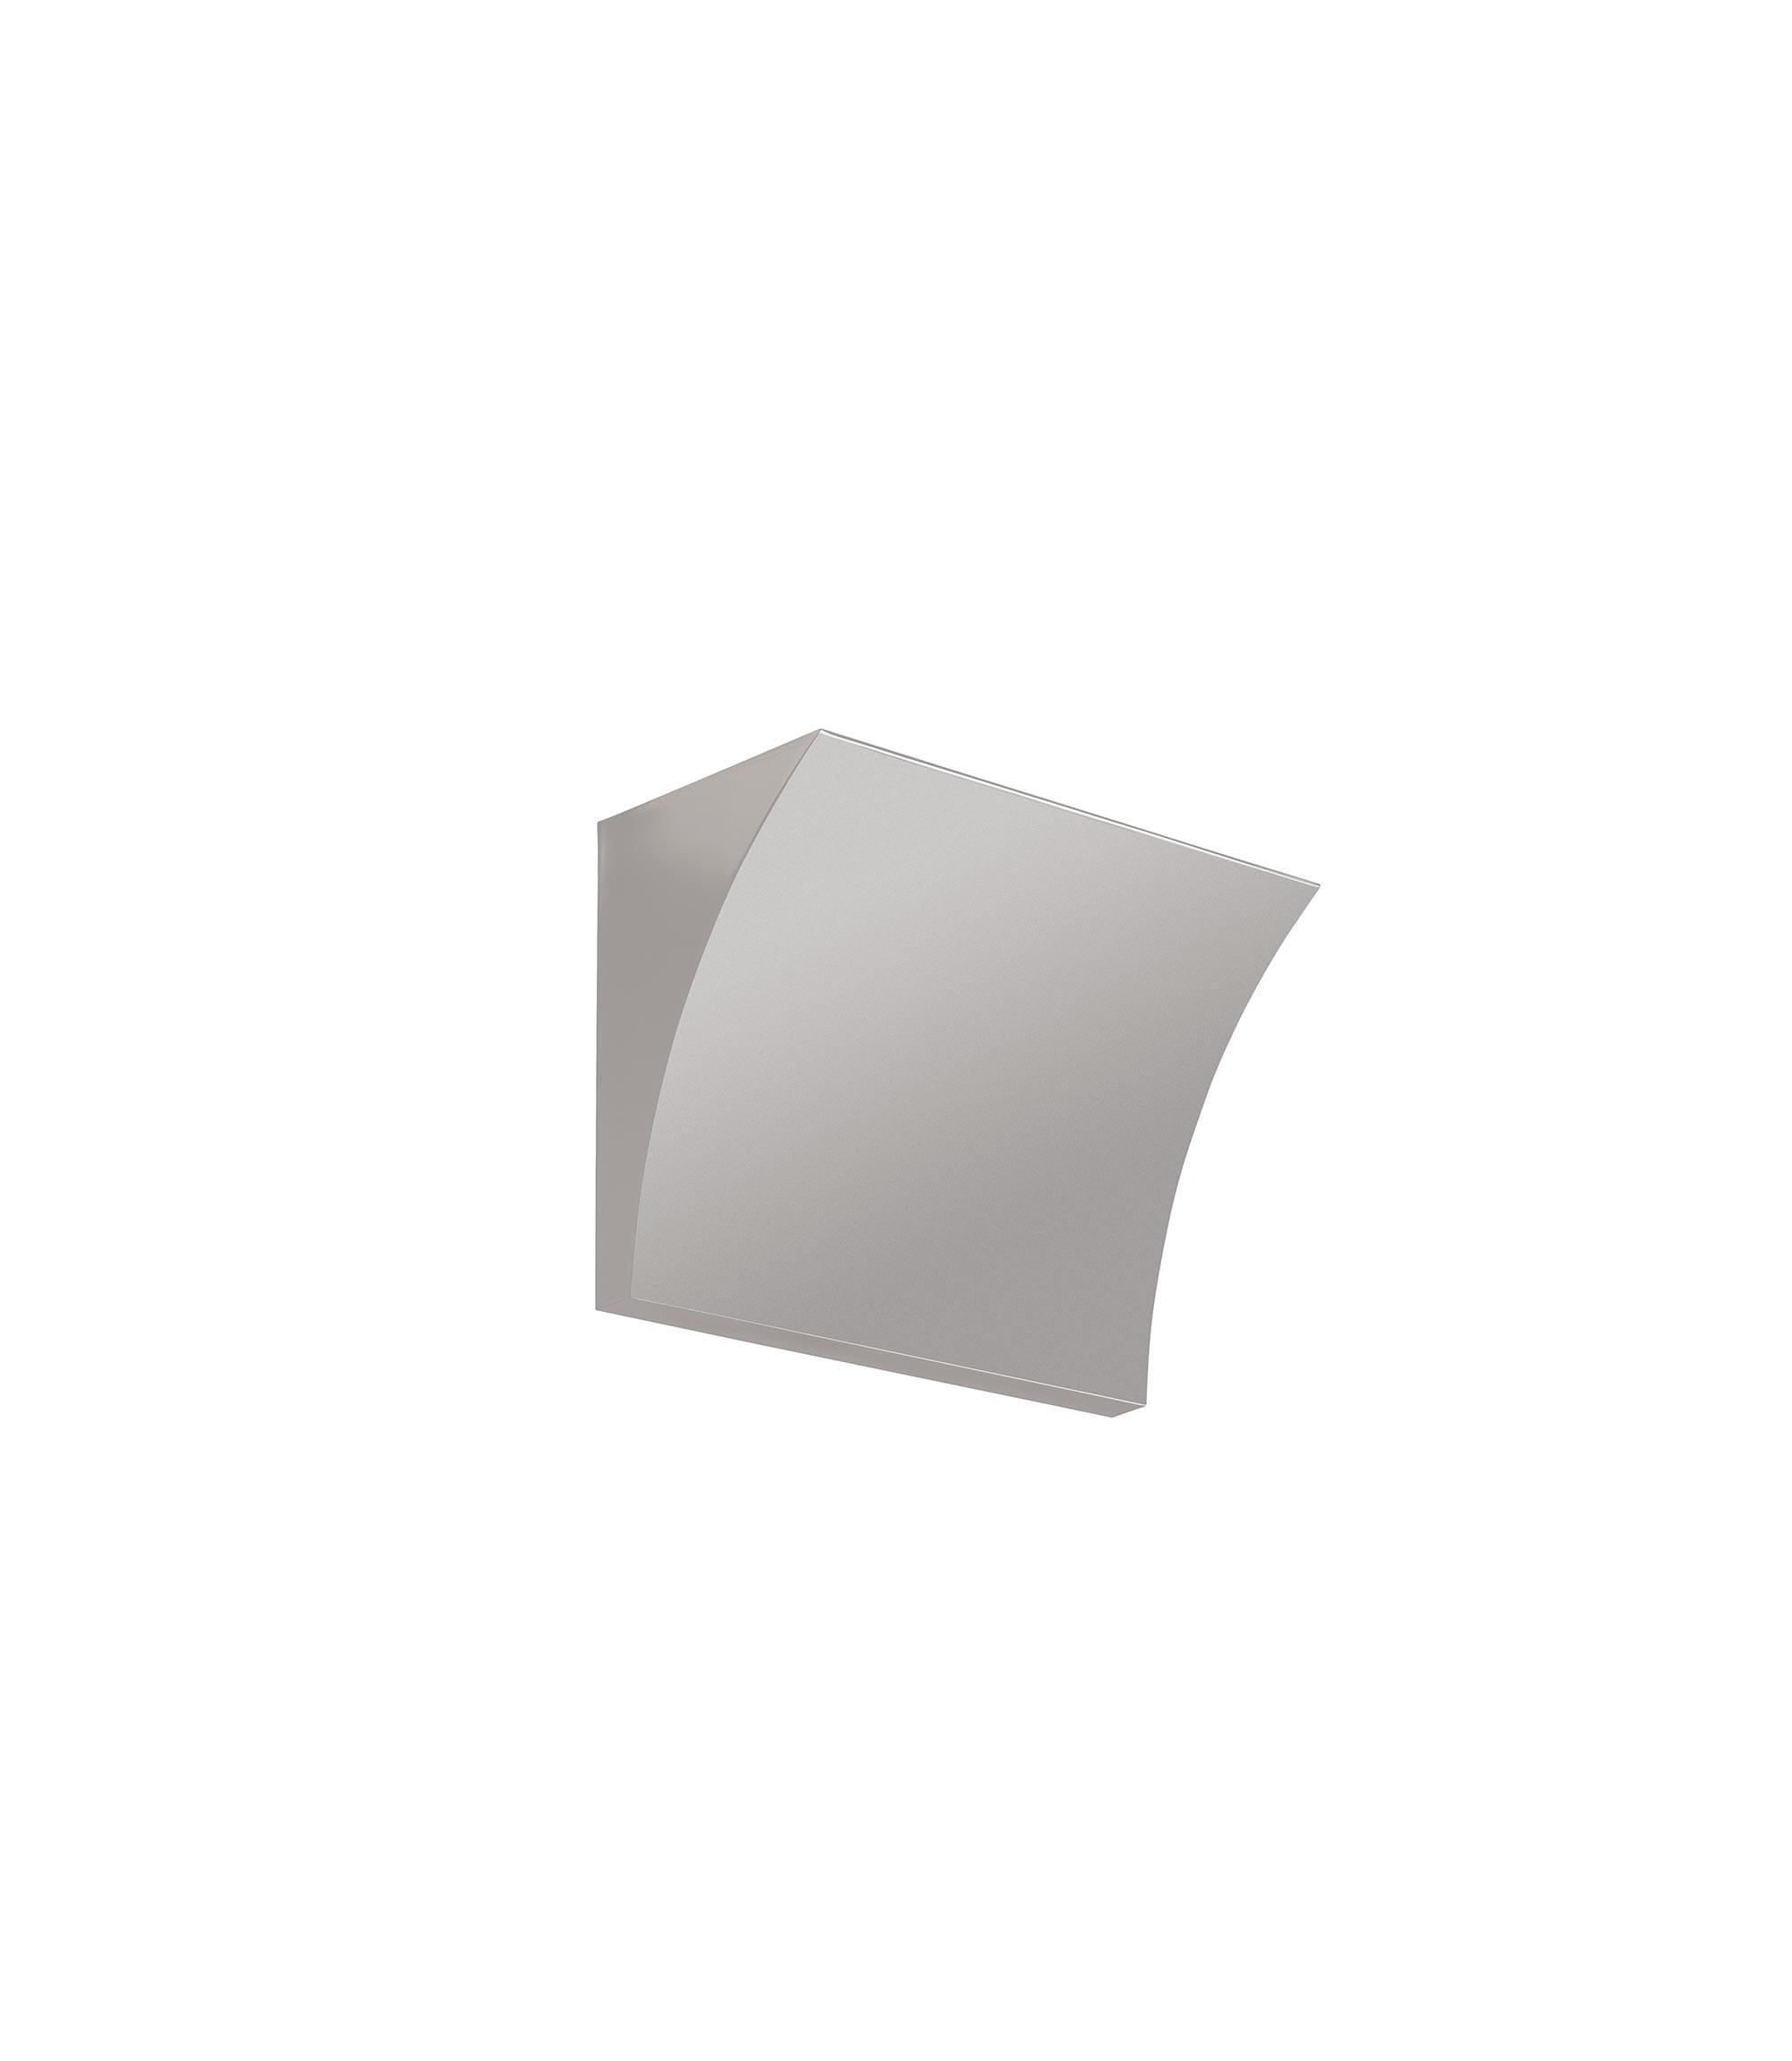 Pochette wall led dordoni flos F9704020 product still life big